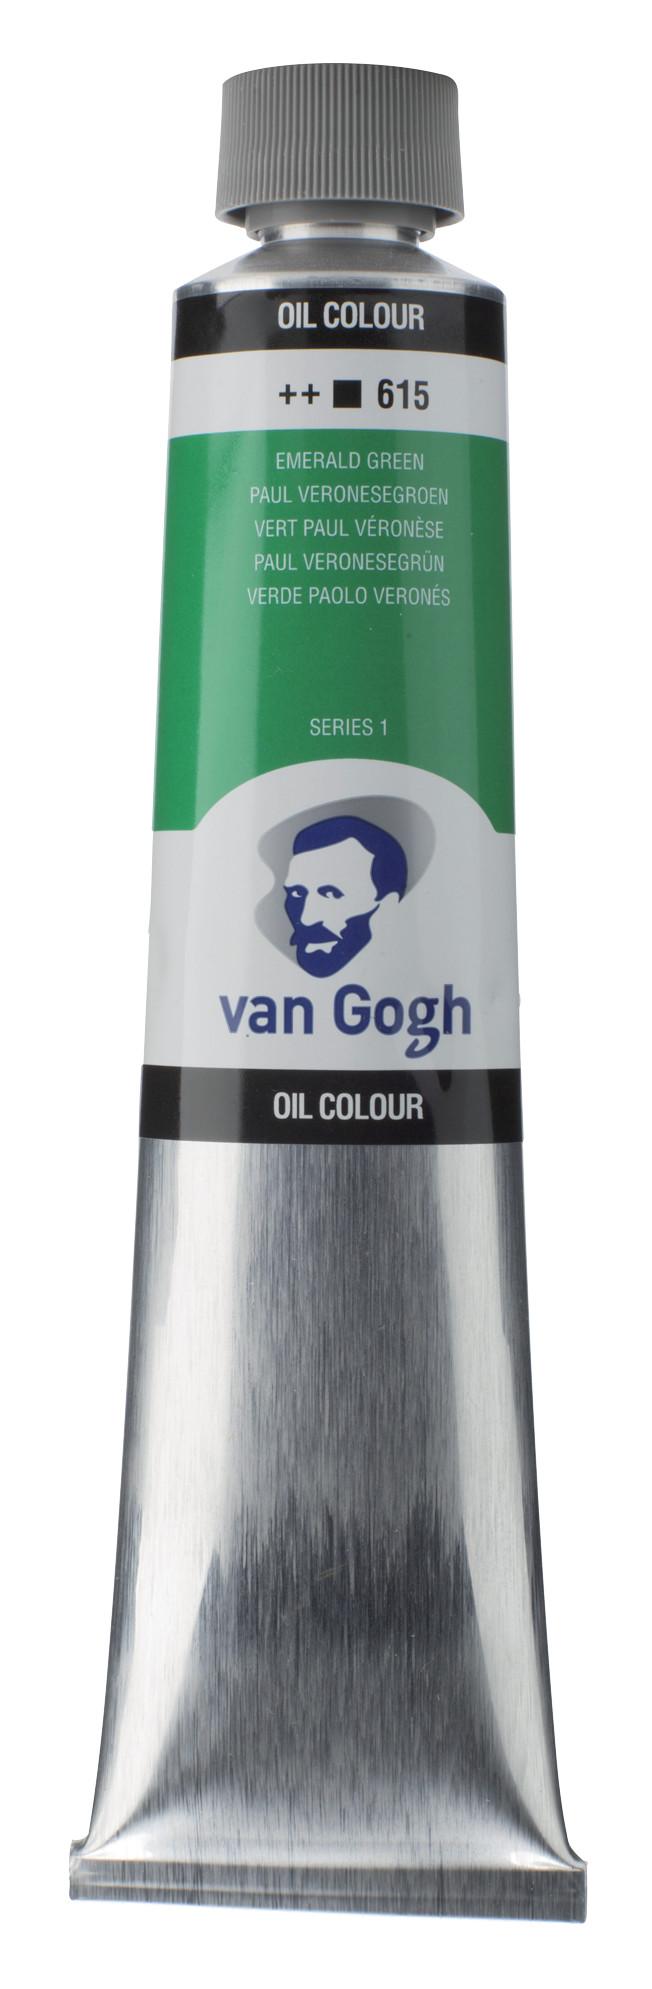 Van Gogh Oil Colour Tube 200 ml Emerald Green 615